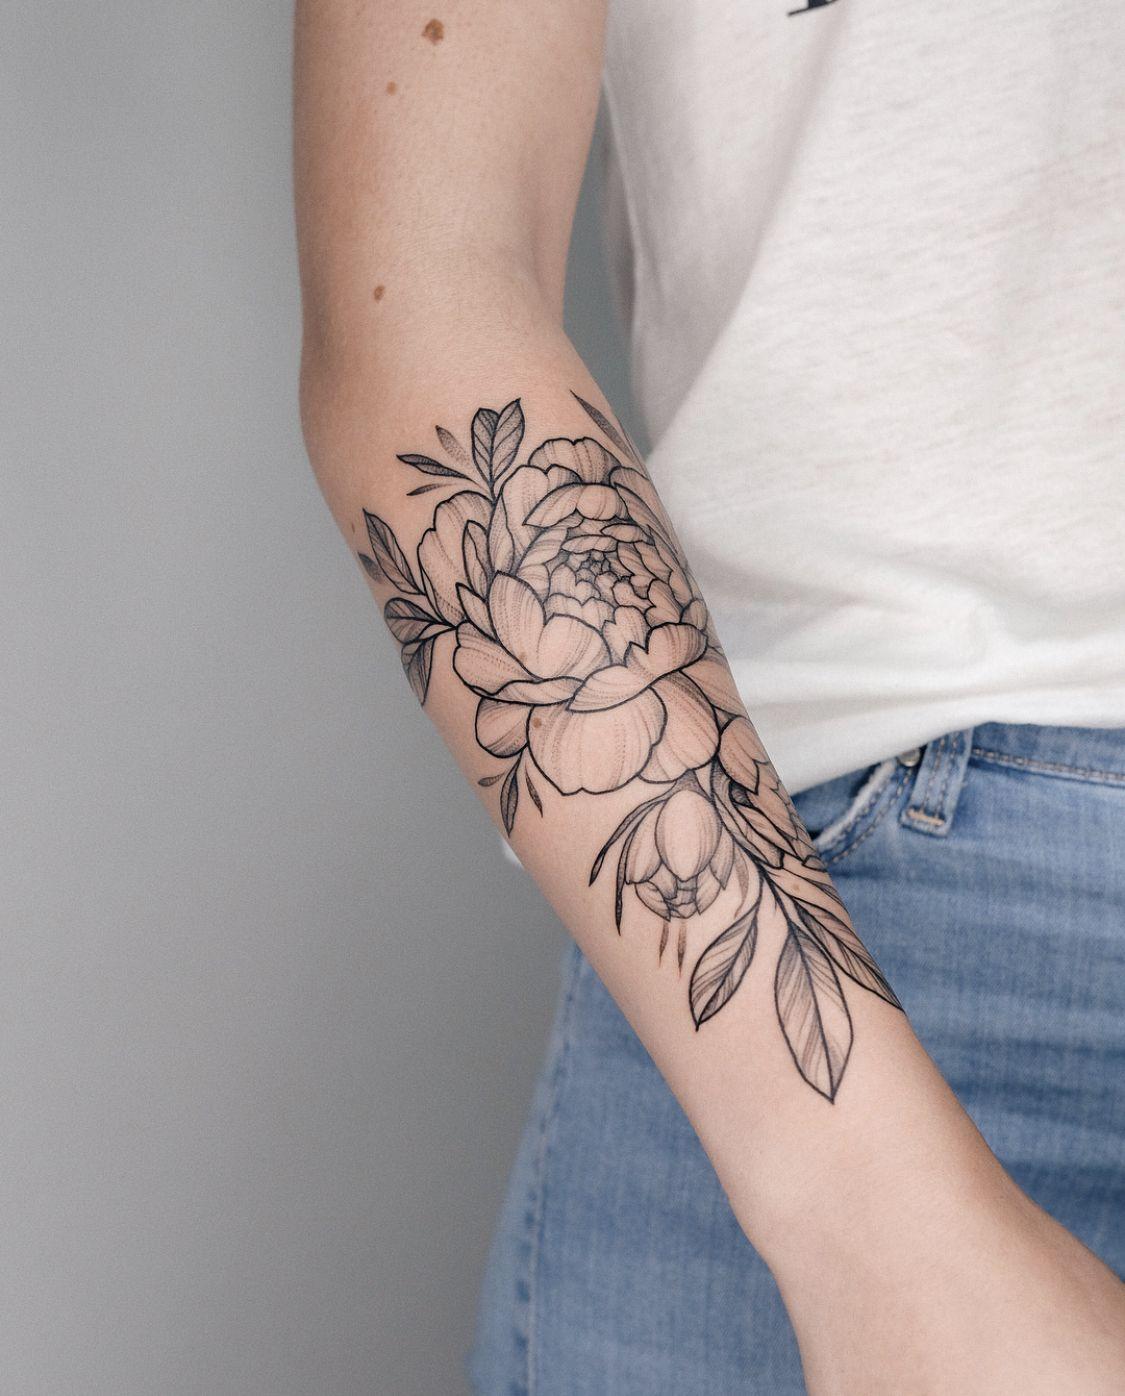 Pin By Chandra Freeman On Tattoo Flower Thigh Tattoos Sleeve Tattoos Thigh Tattoo